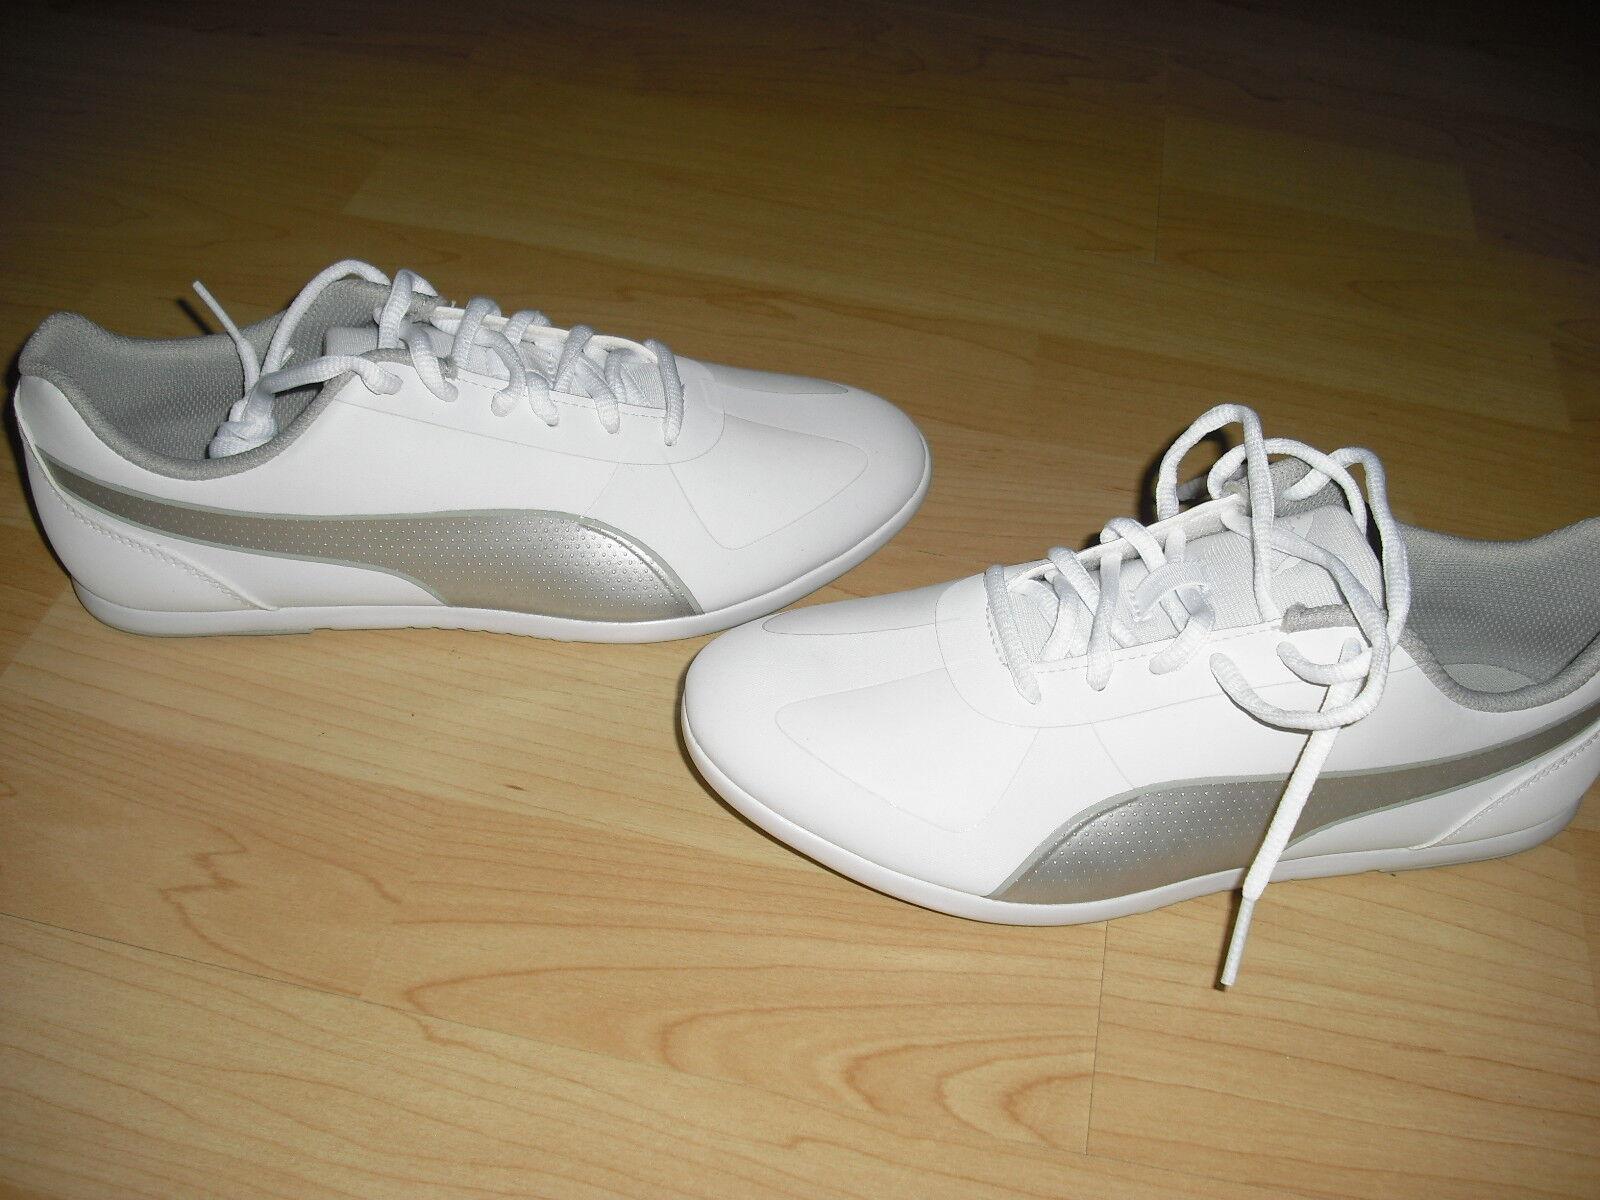 Sneaker Turnschuhe von Puma weiß grau siber Gr. 38,5 UK 5.5 NEU